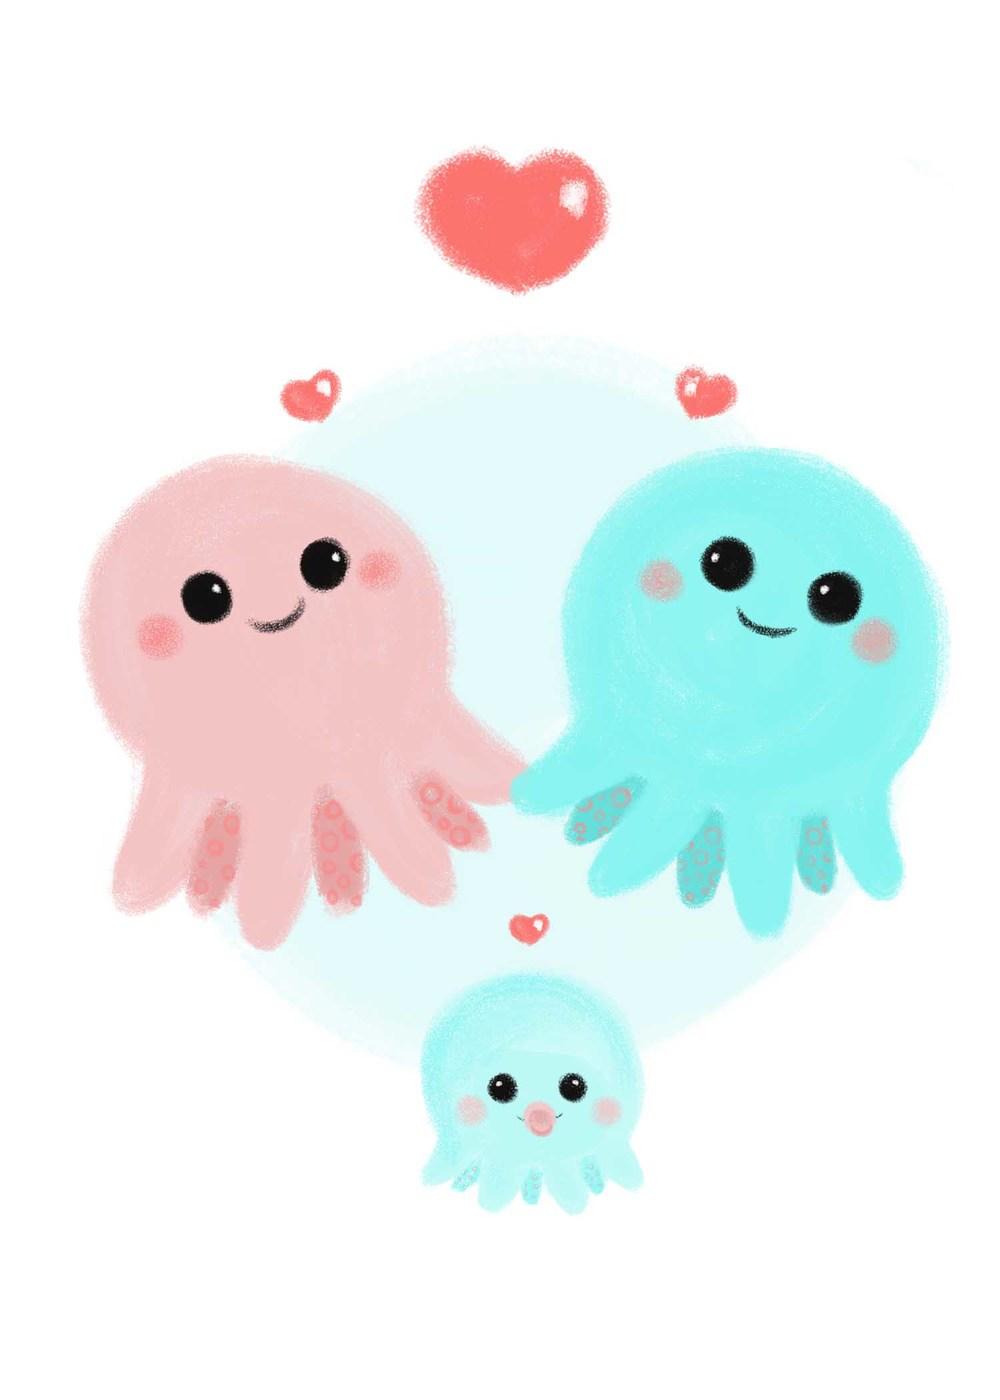 octopus baby.jpg